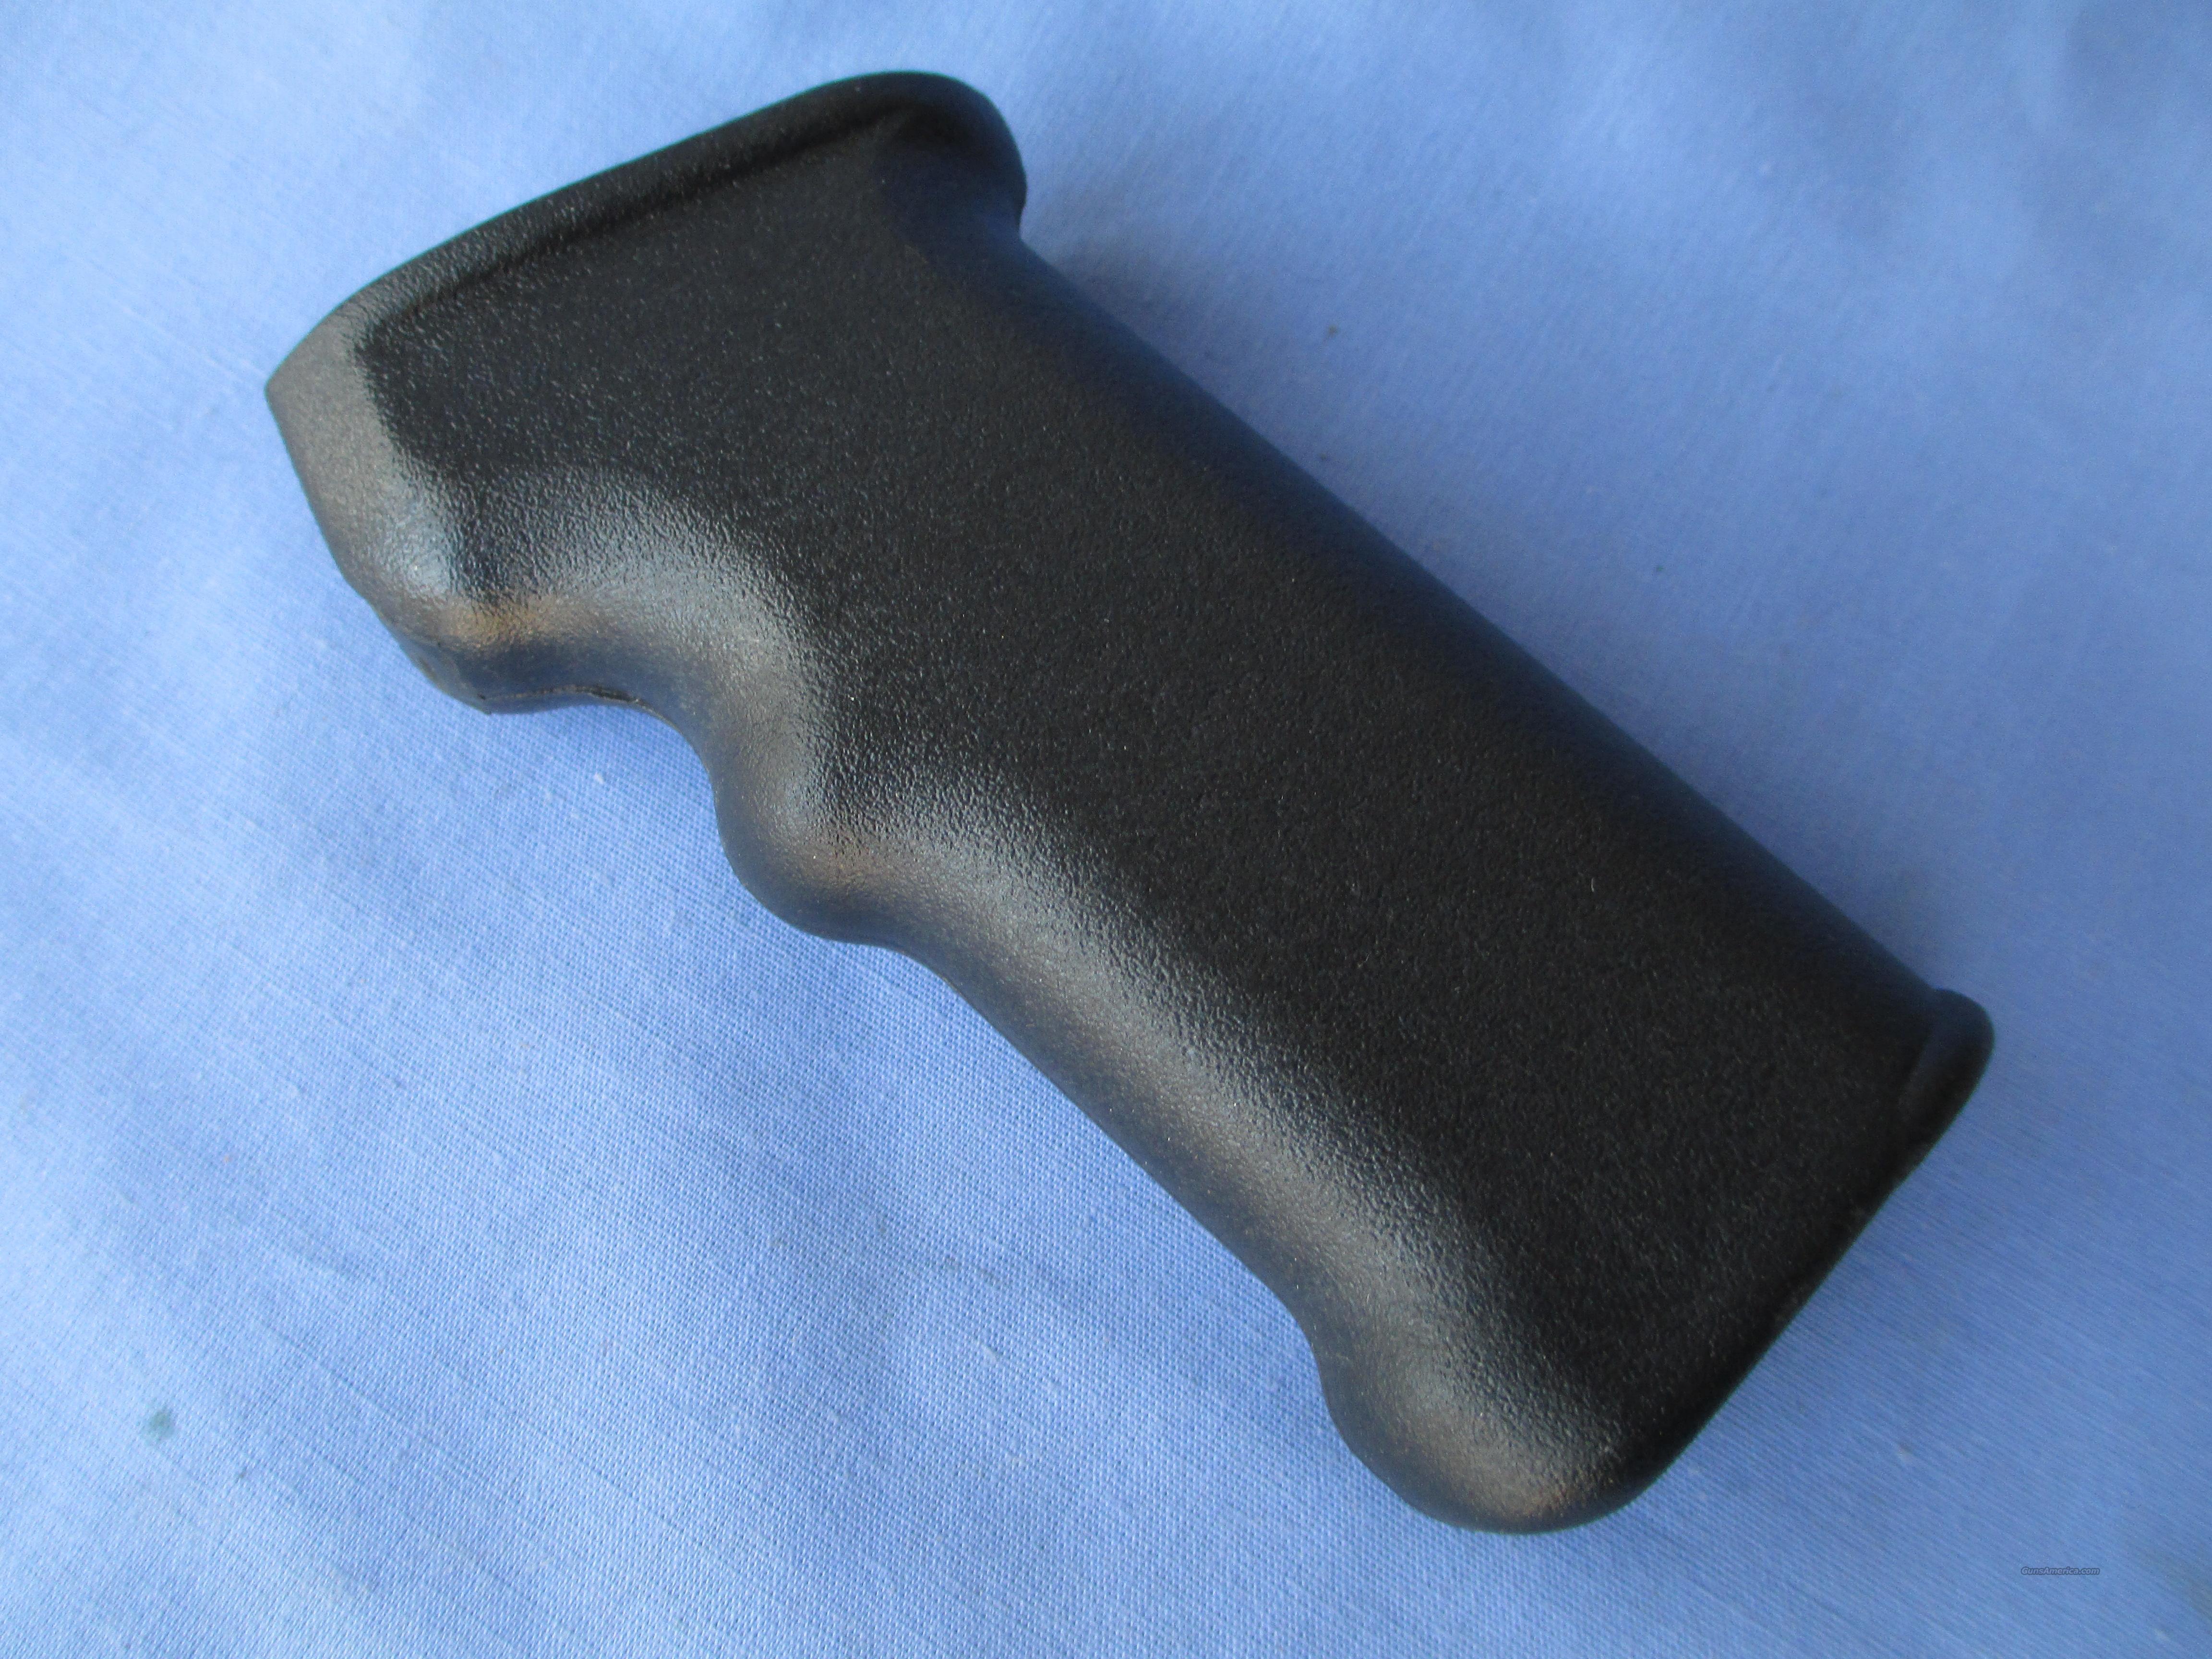 AK47 US MFG. PISTOLGRIP......BLACK  Non-Guns > Gun Parts > Military - Foreign